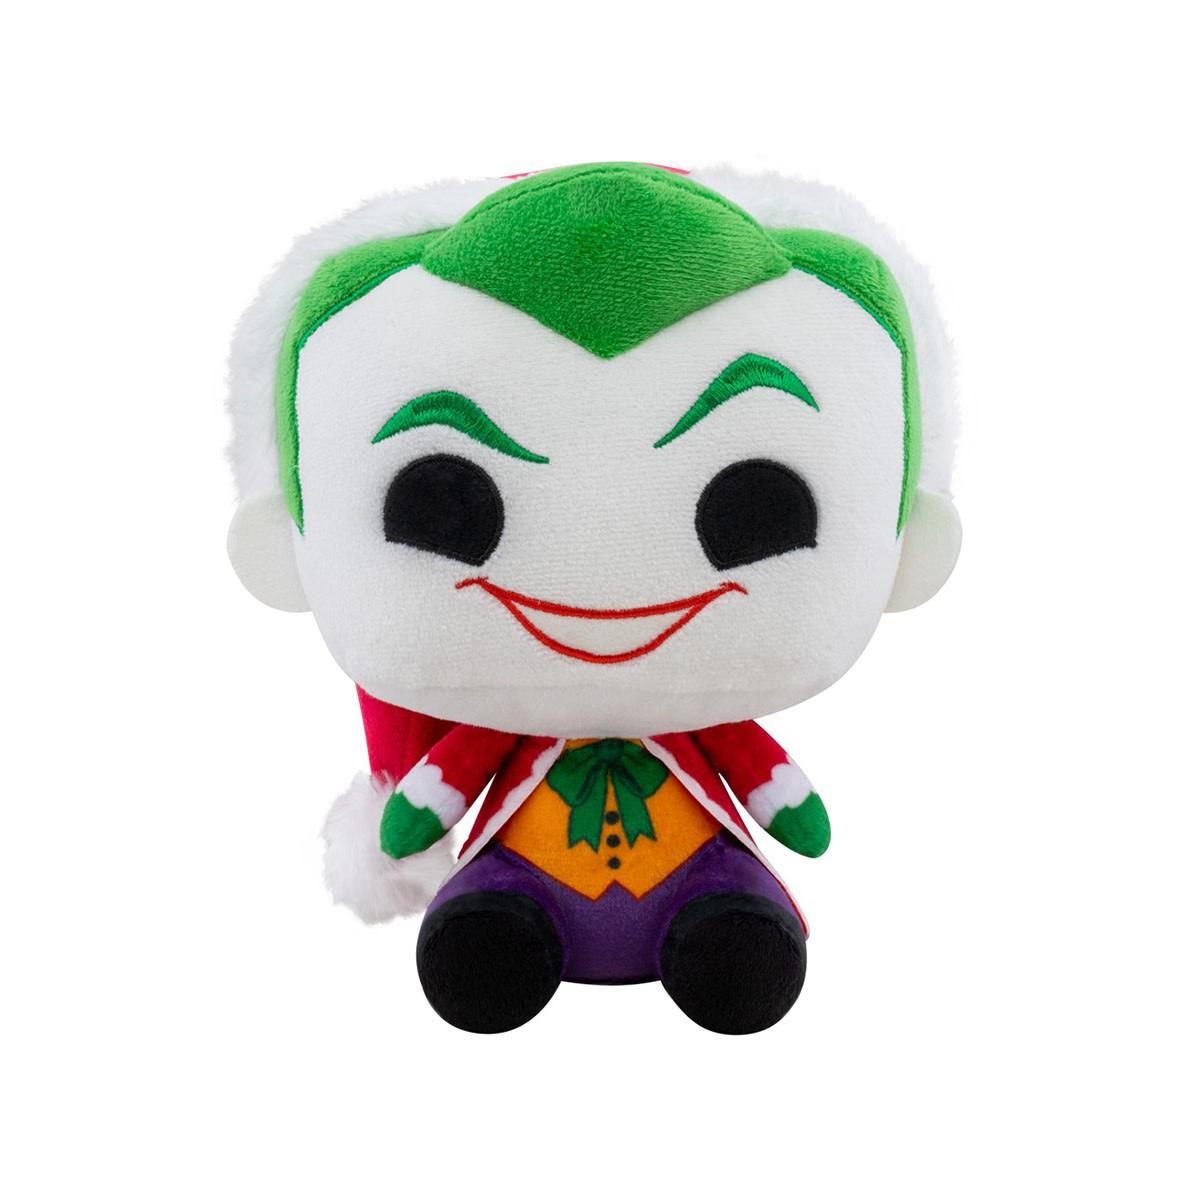 FUNKO Pop! Plush: DC Holiday - Santa Joker 7 inch Plush